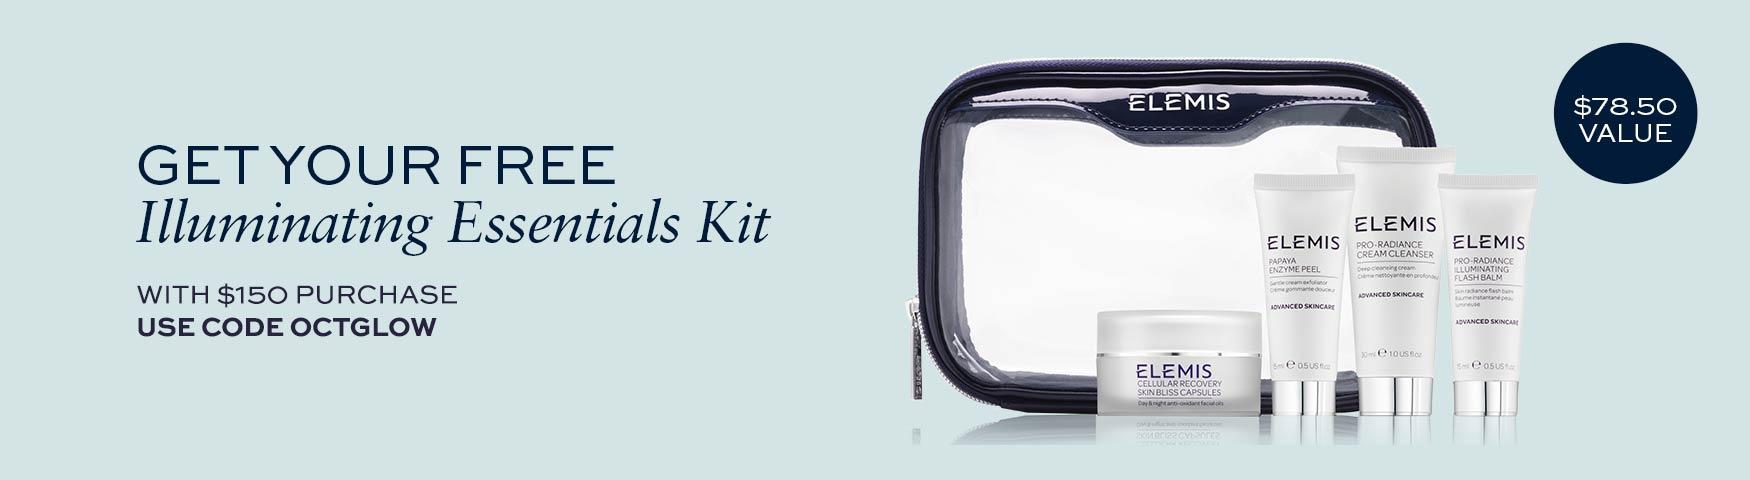 Free Illuminating Essentials GWP